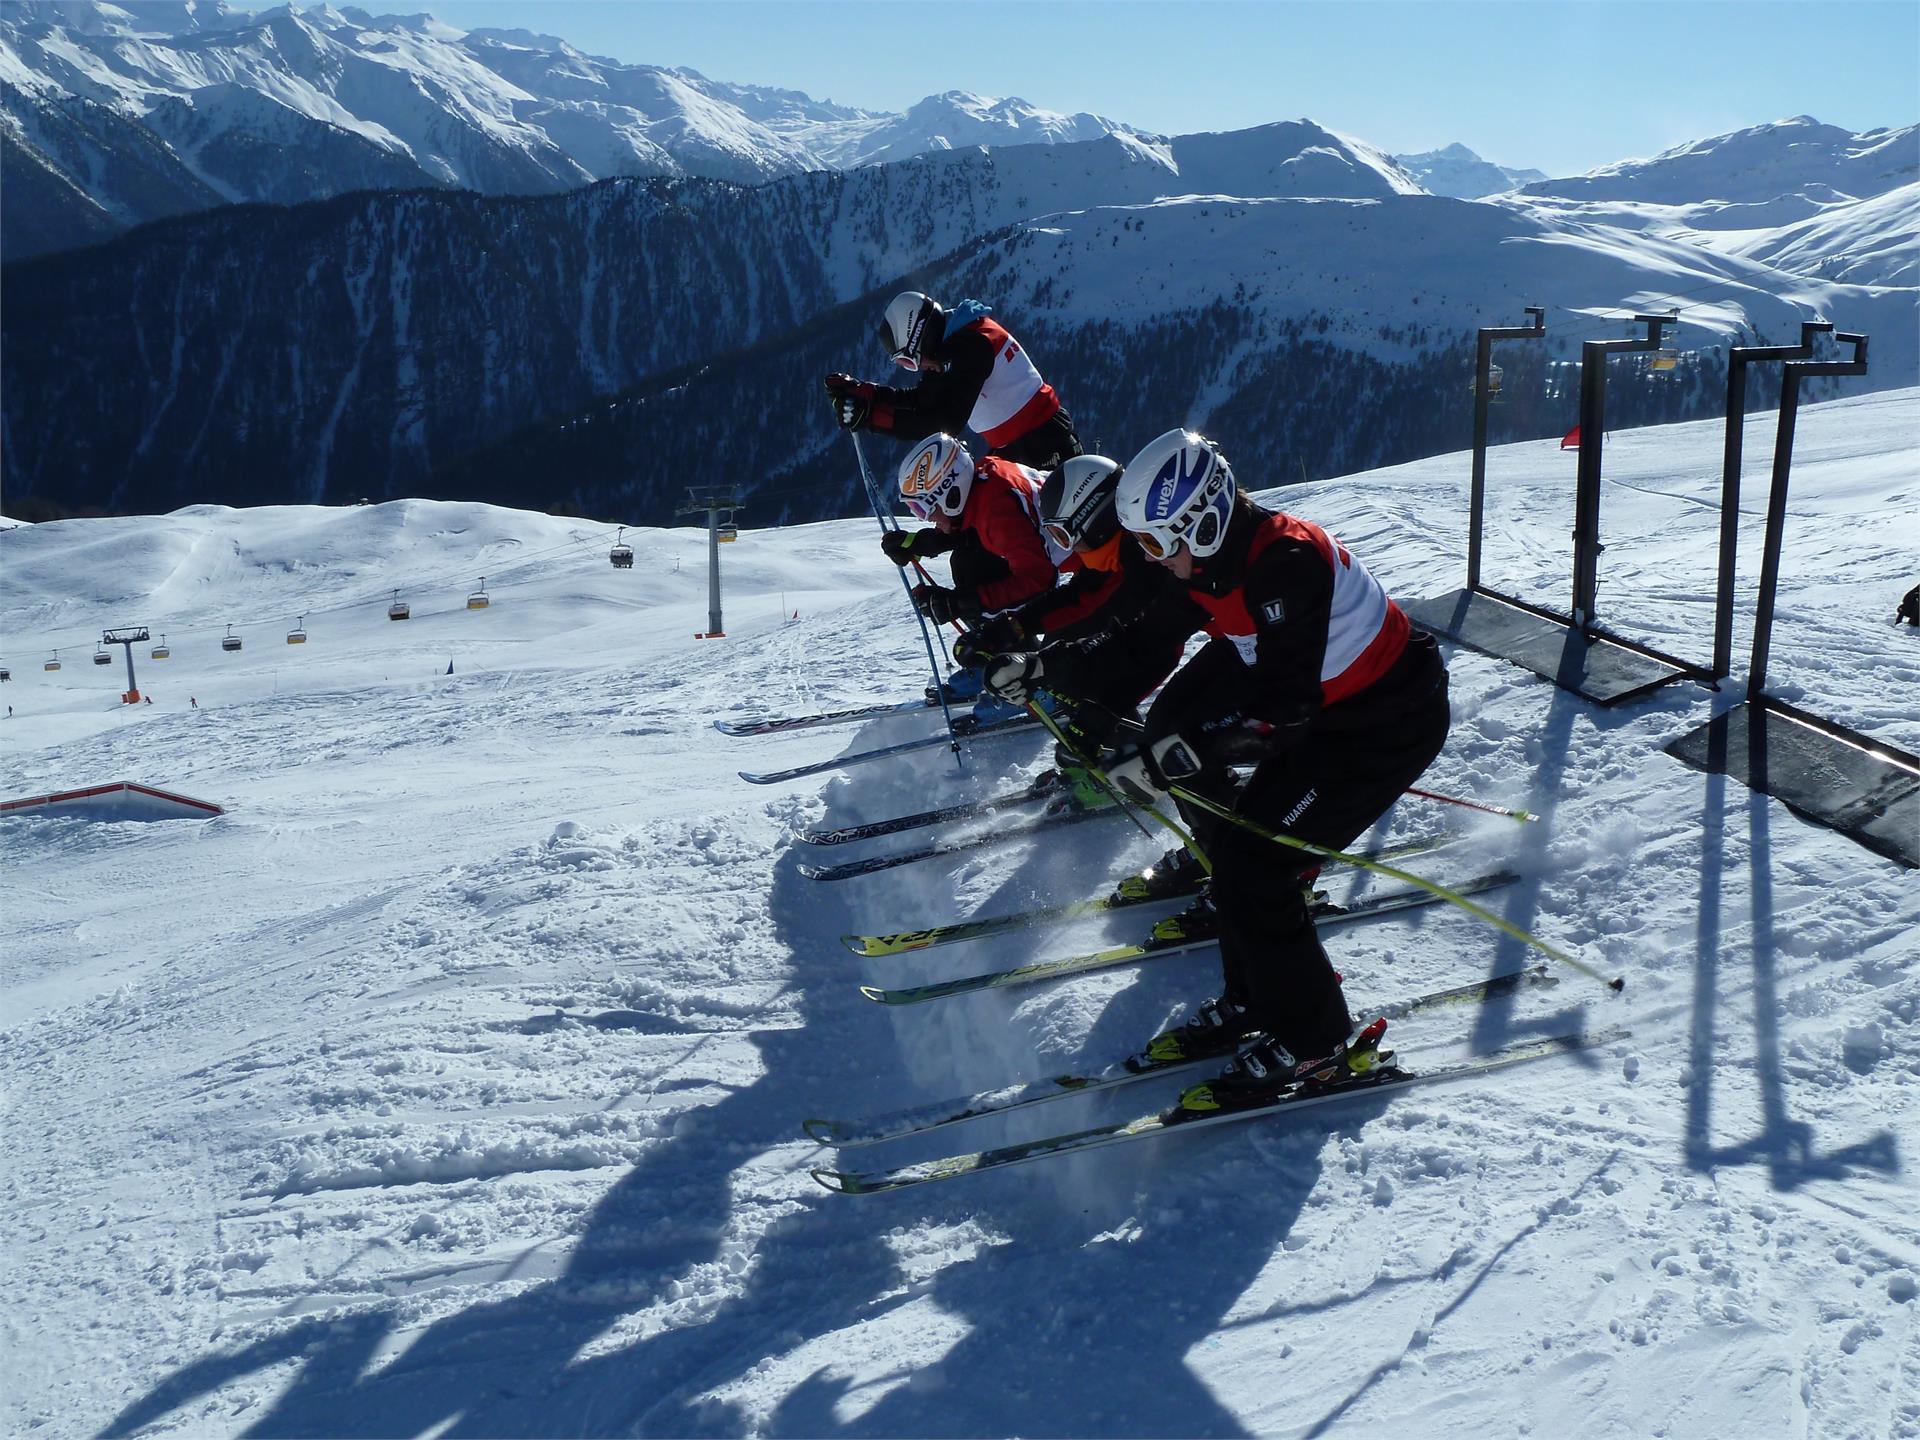 Ski-Cross Piste